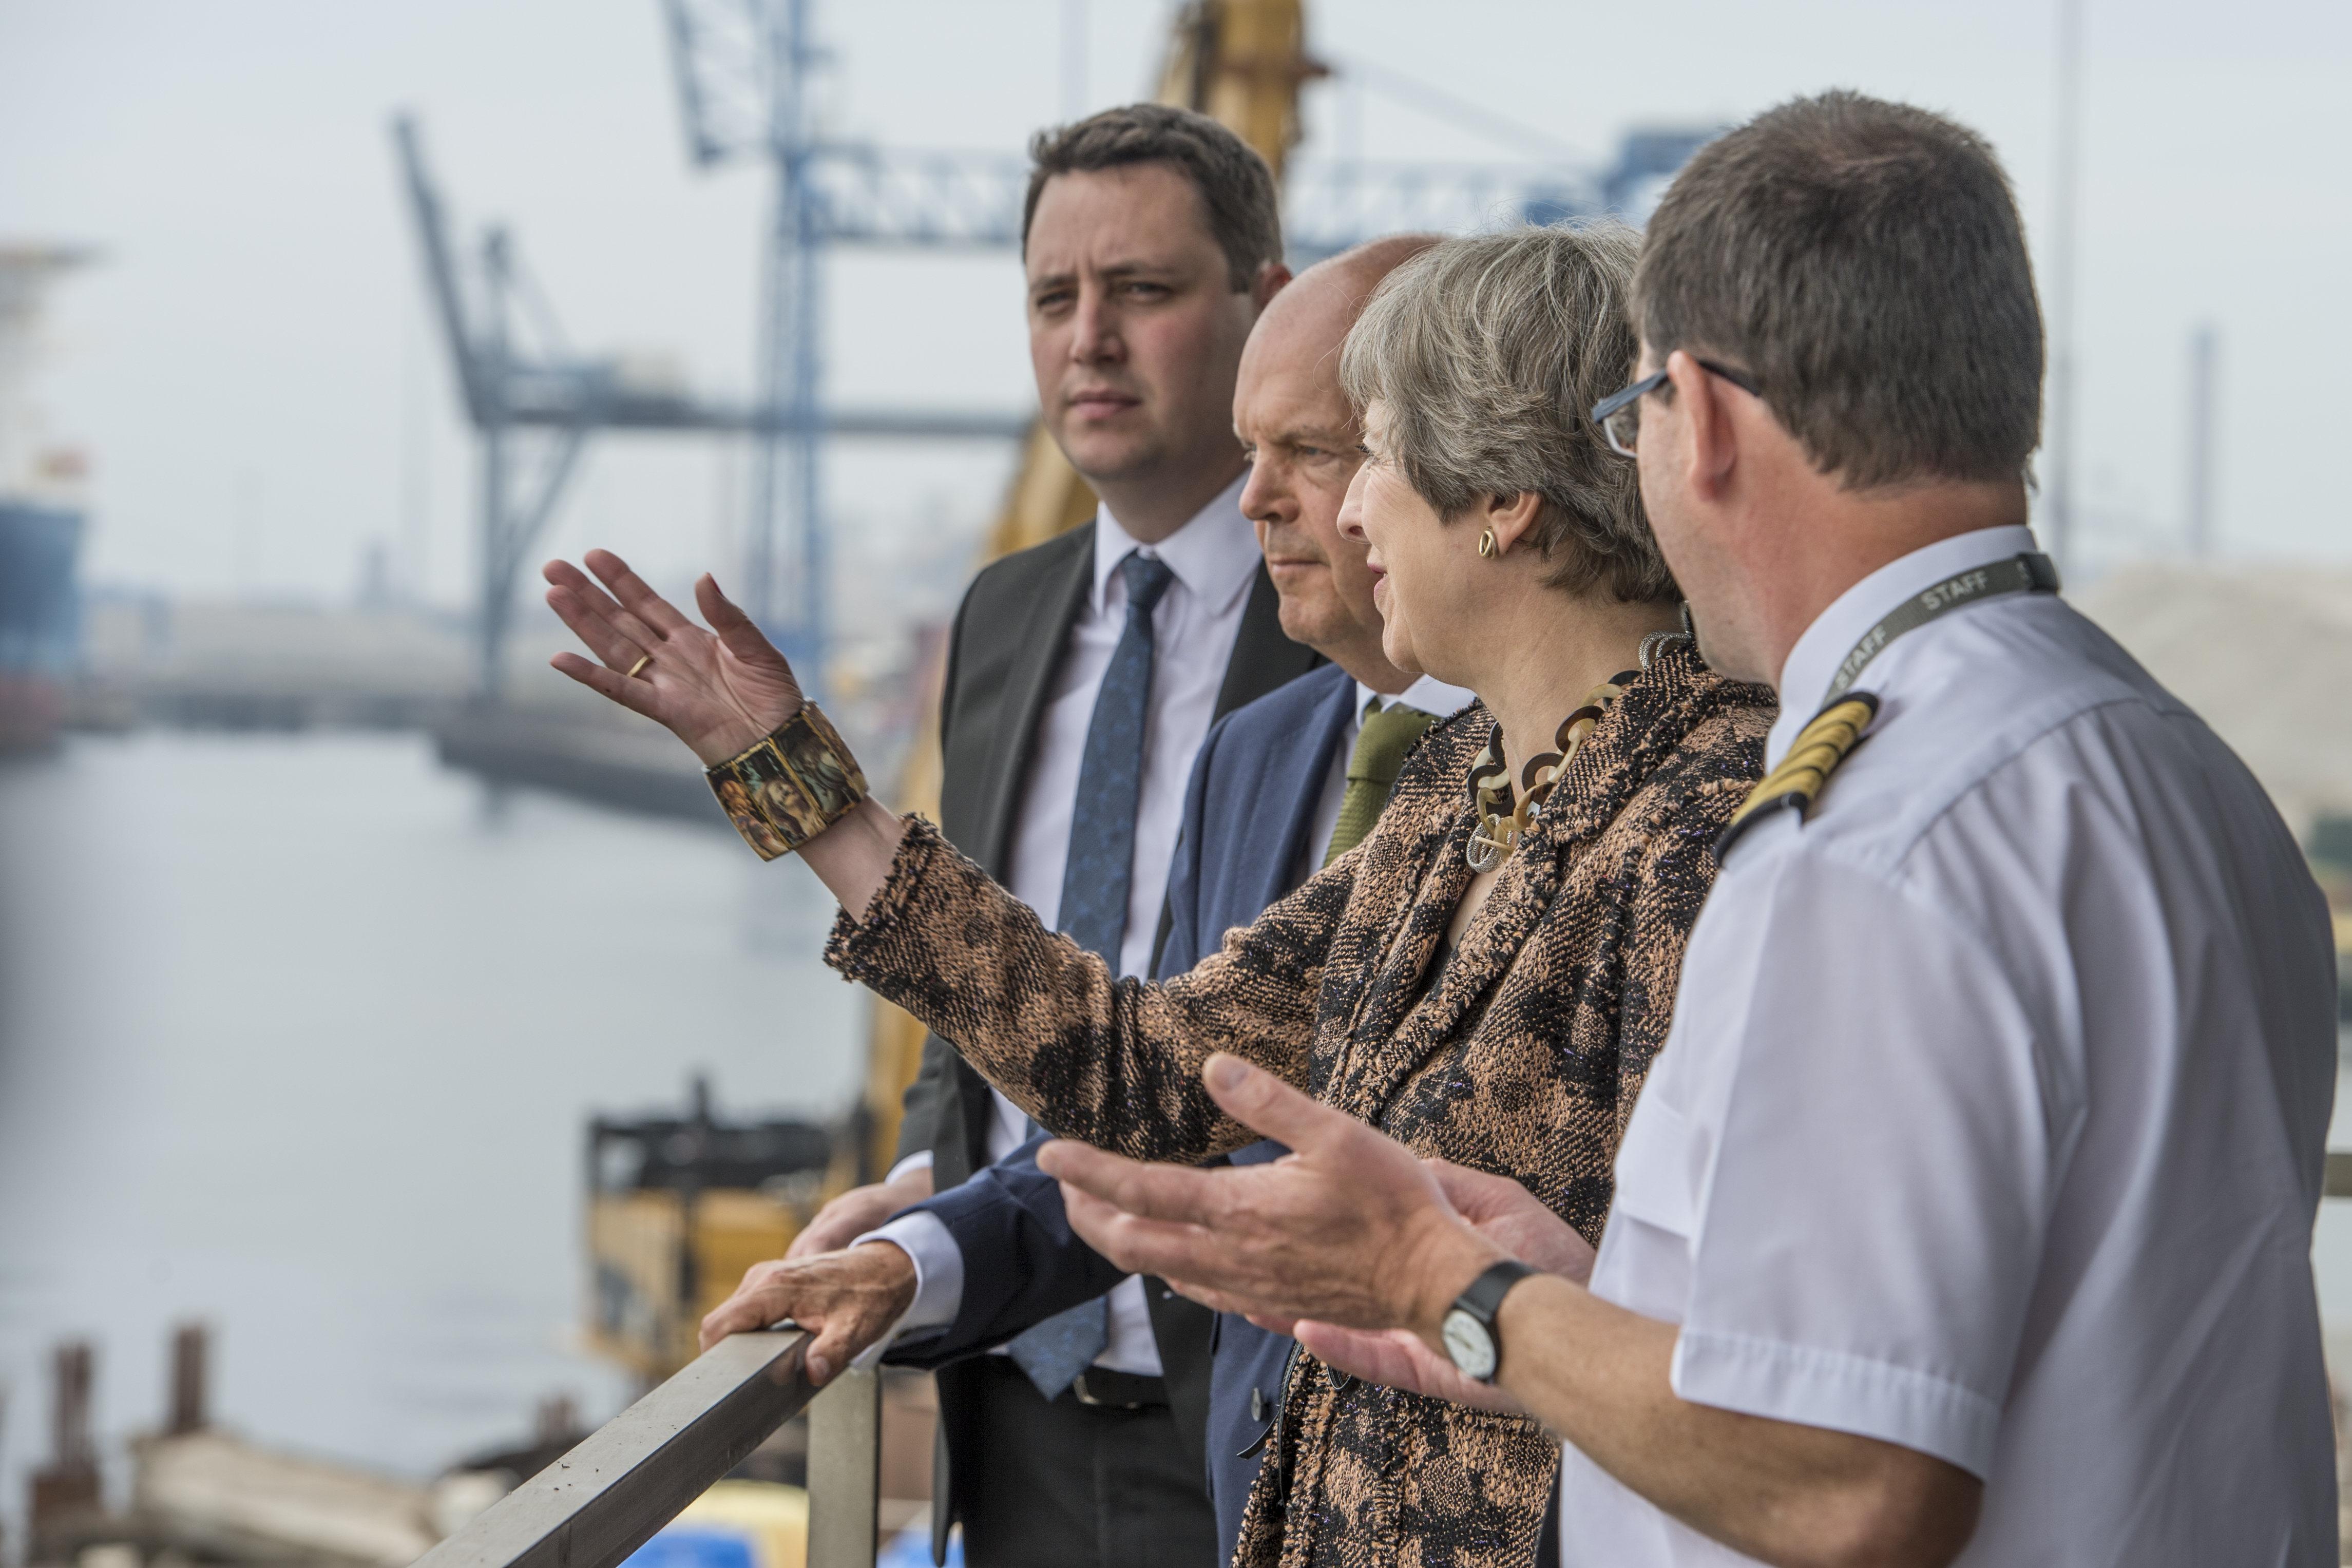 Major port group warns UK businesses against 'Brexit Blinkers'